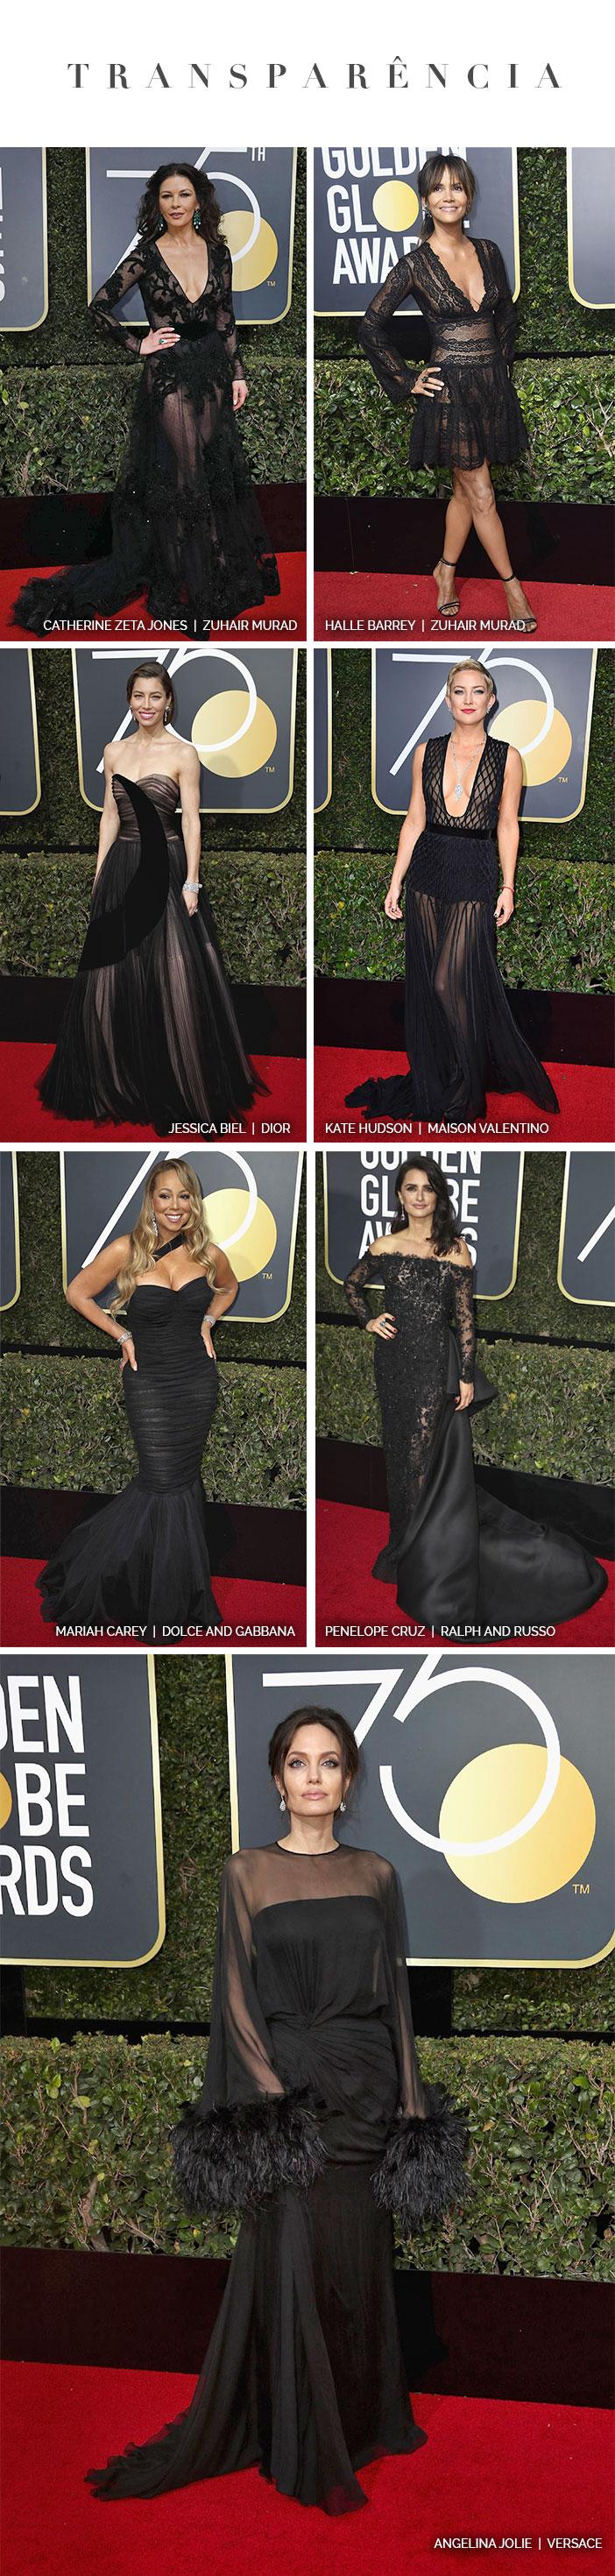 Red carpet: Golden Globe Awards 2018 - Looks com Transparência